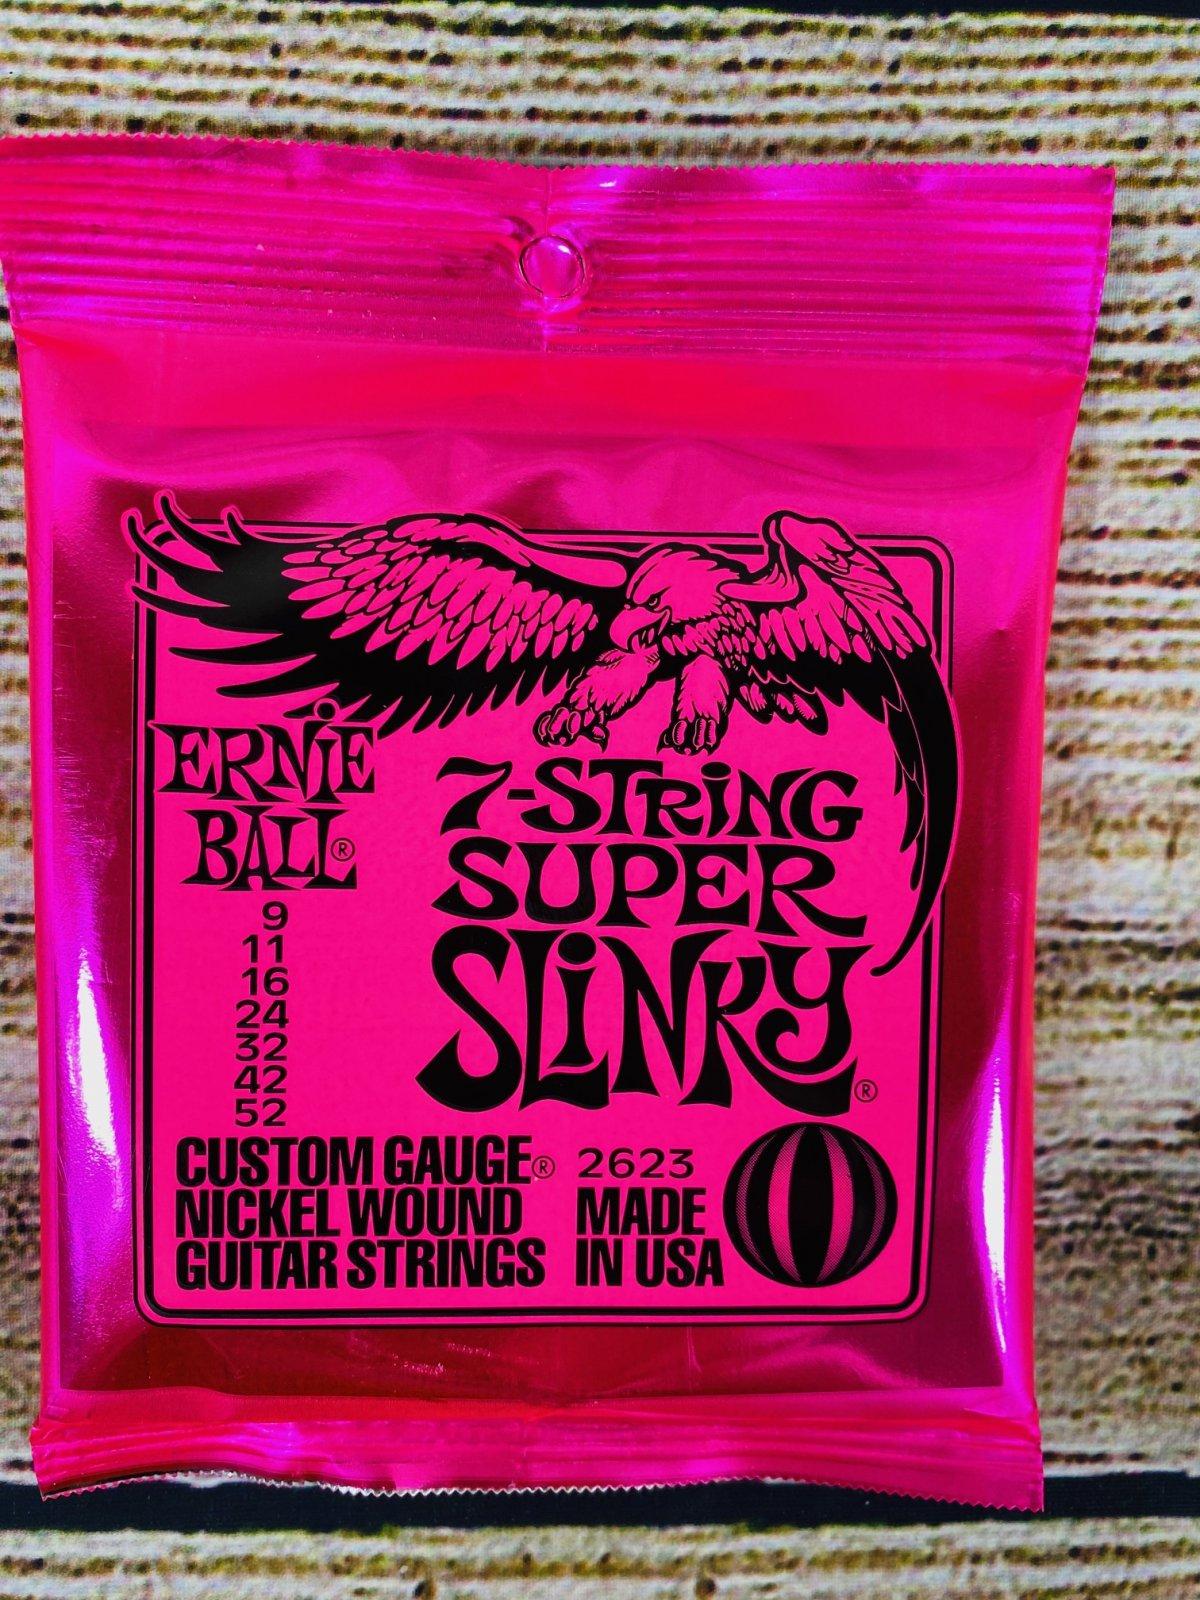 Ernie Ball 2623 Super Slinky 7-string Nickel Wound Electric Guitar Strings - .009-.052